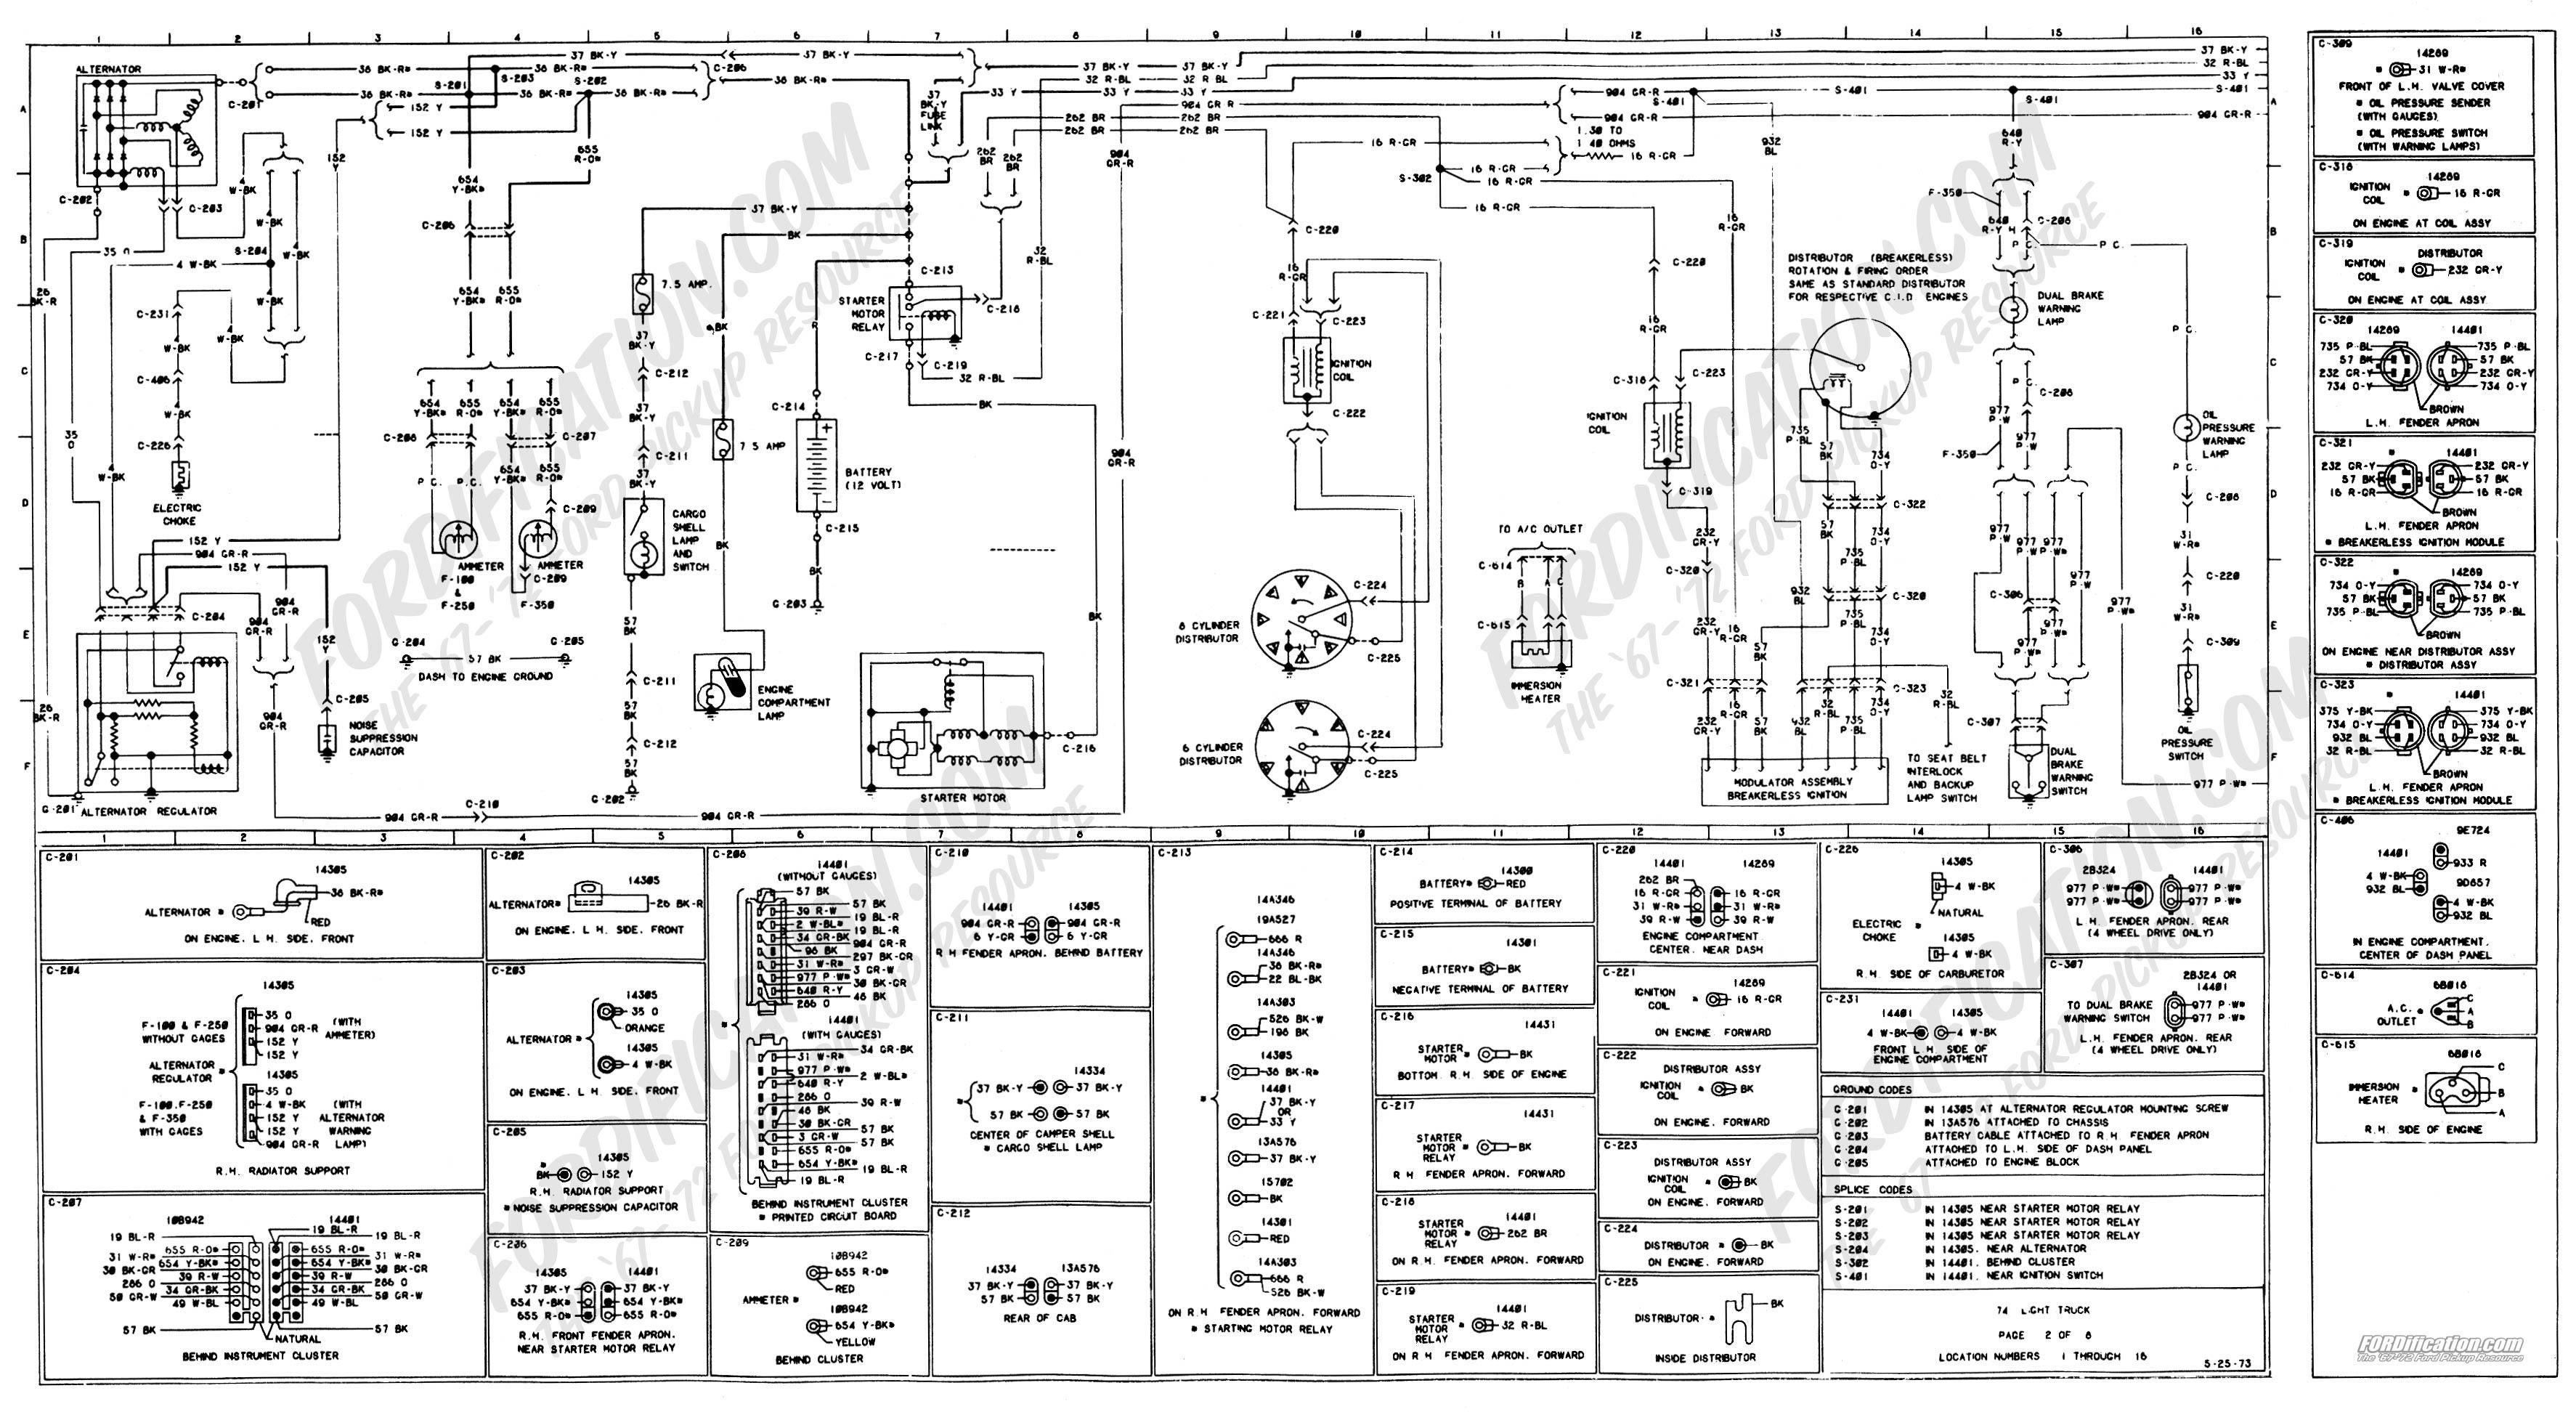 Bird Bus Wiring Diagrams On 2000 Fl70 Freightliner Fuse Box Diagram Wiring Diagram Local D Local D Maceratadoc It